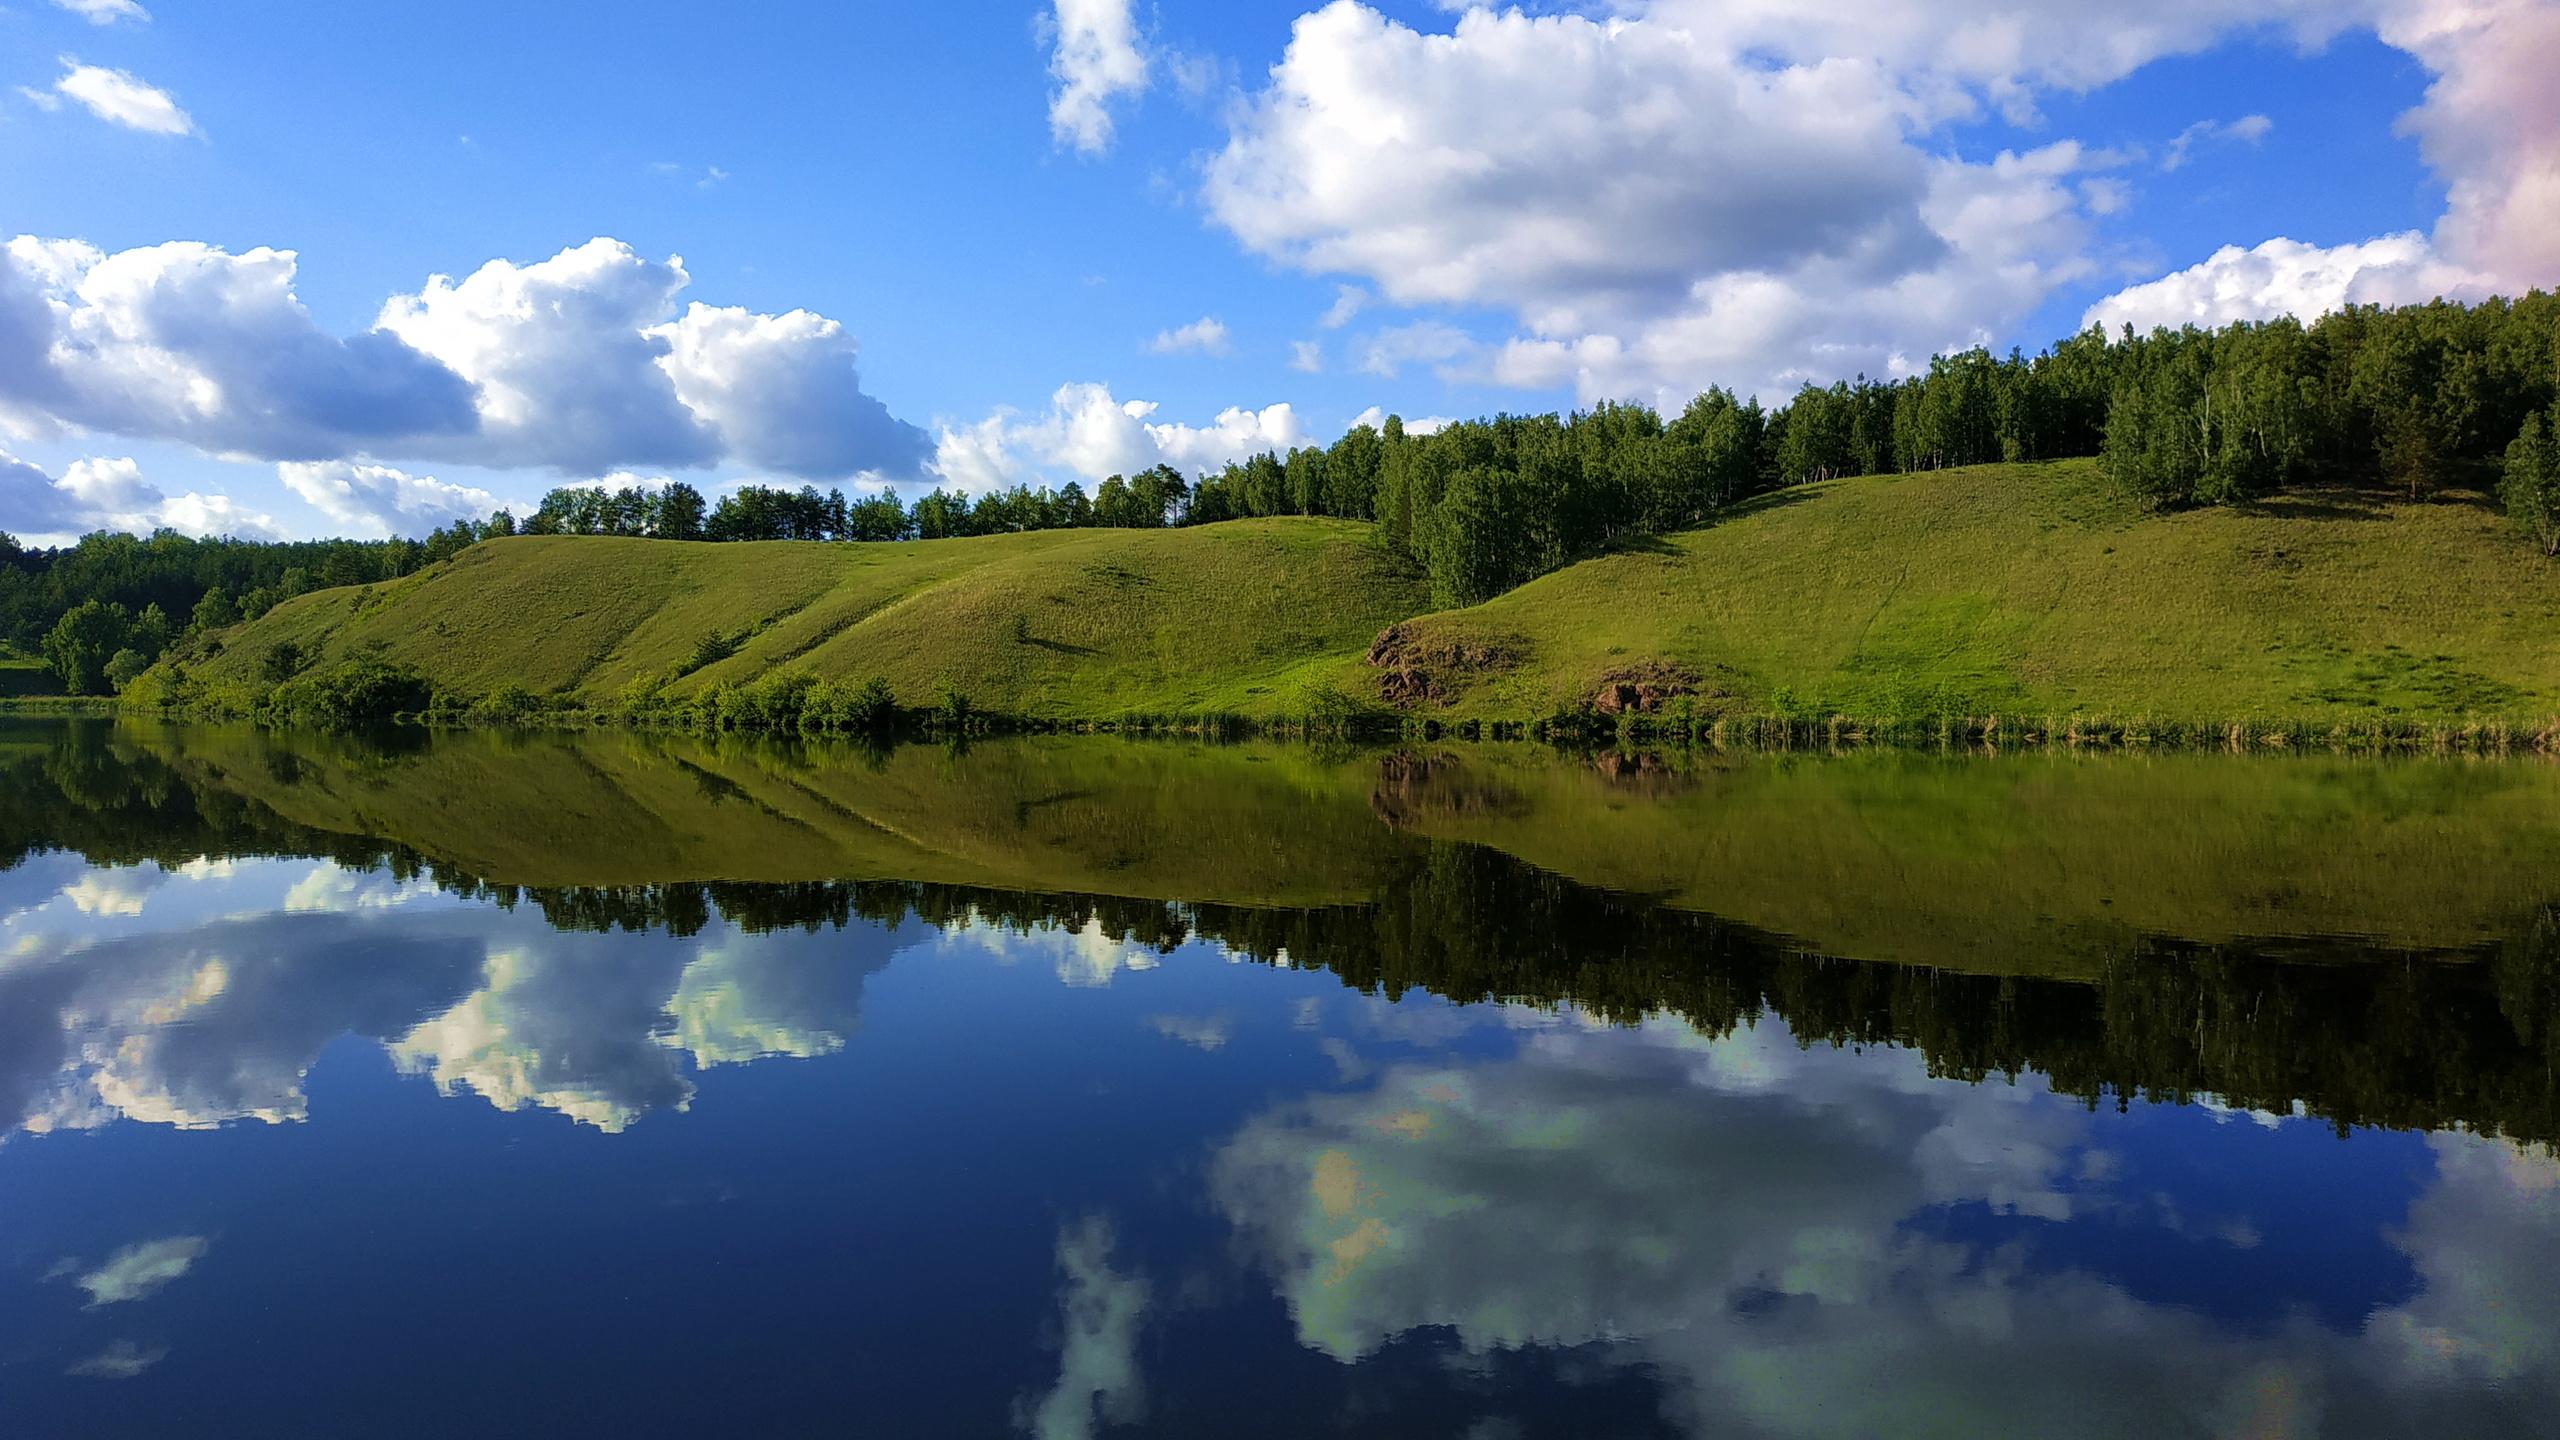 река, отражение, вода, ясно, берег, облака, природа, небо, лето, штиль